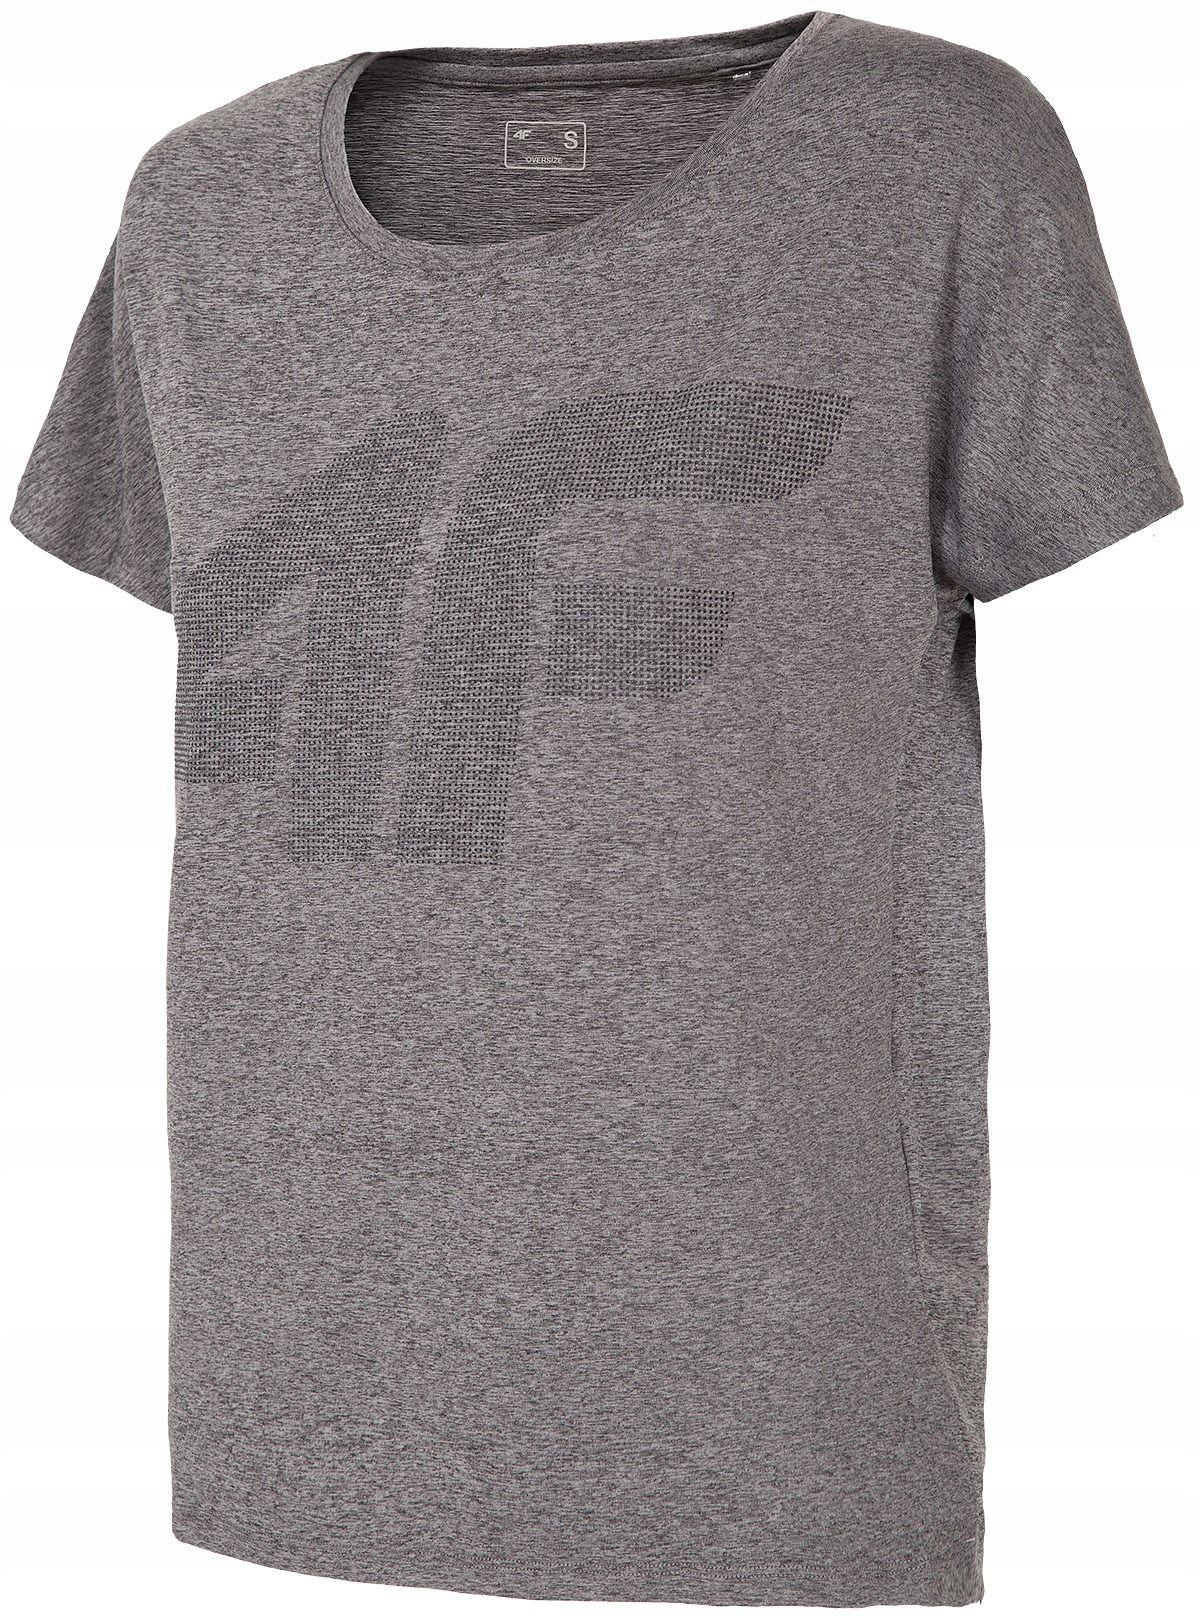 T-Shirt Damski Termoaktywny 4F TSDF005 S Oversize